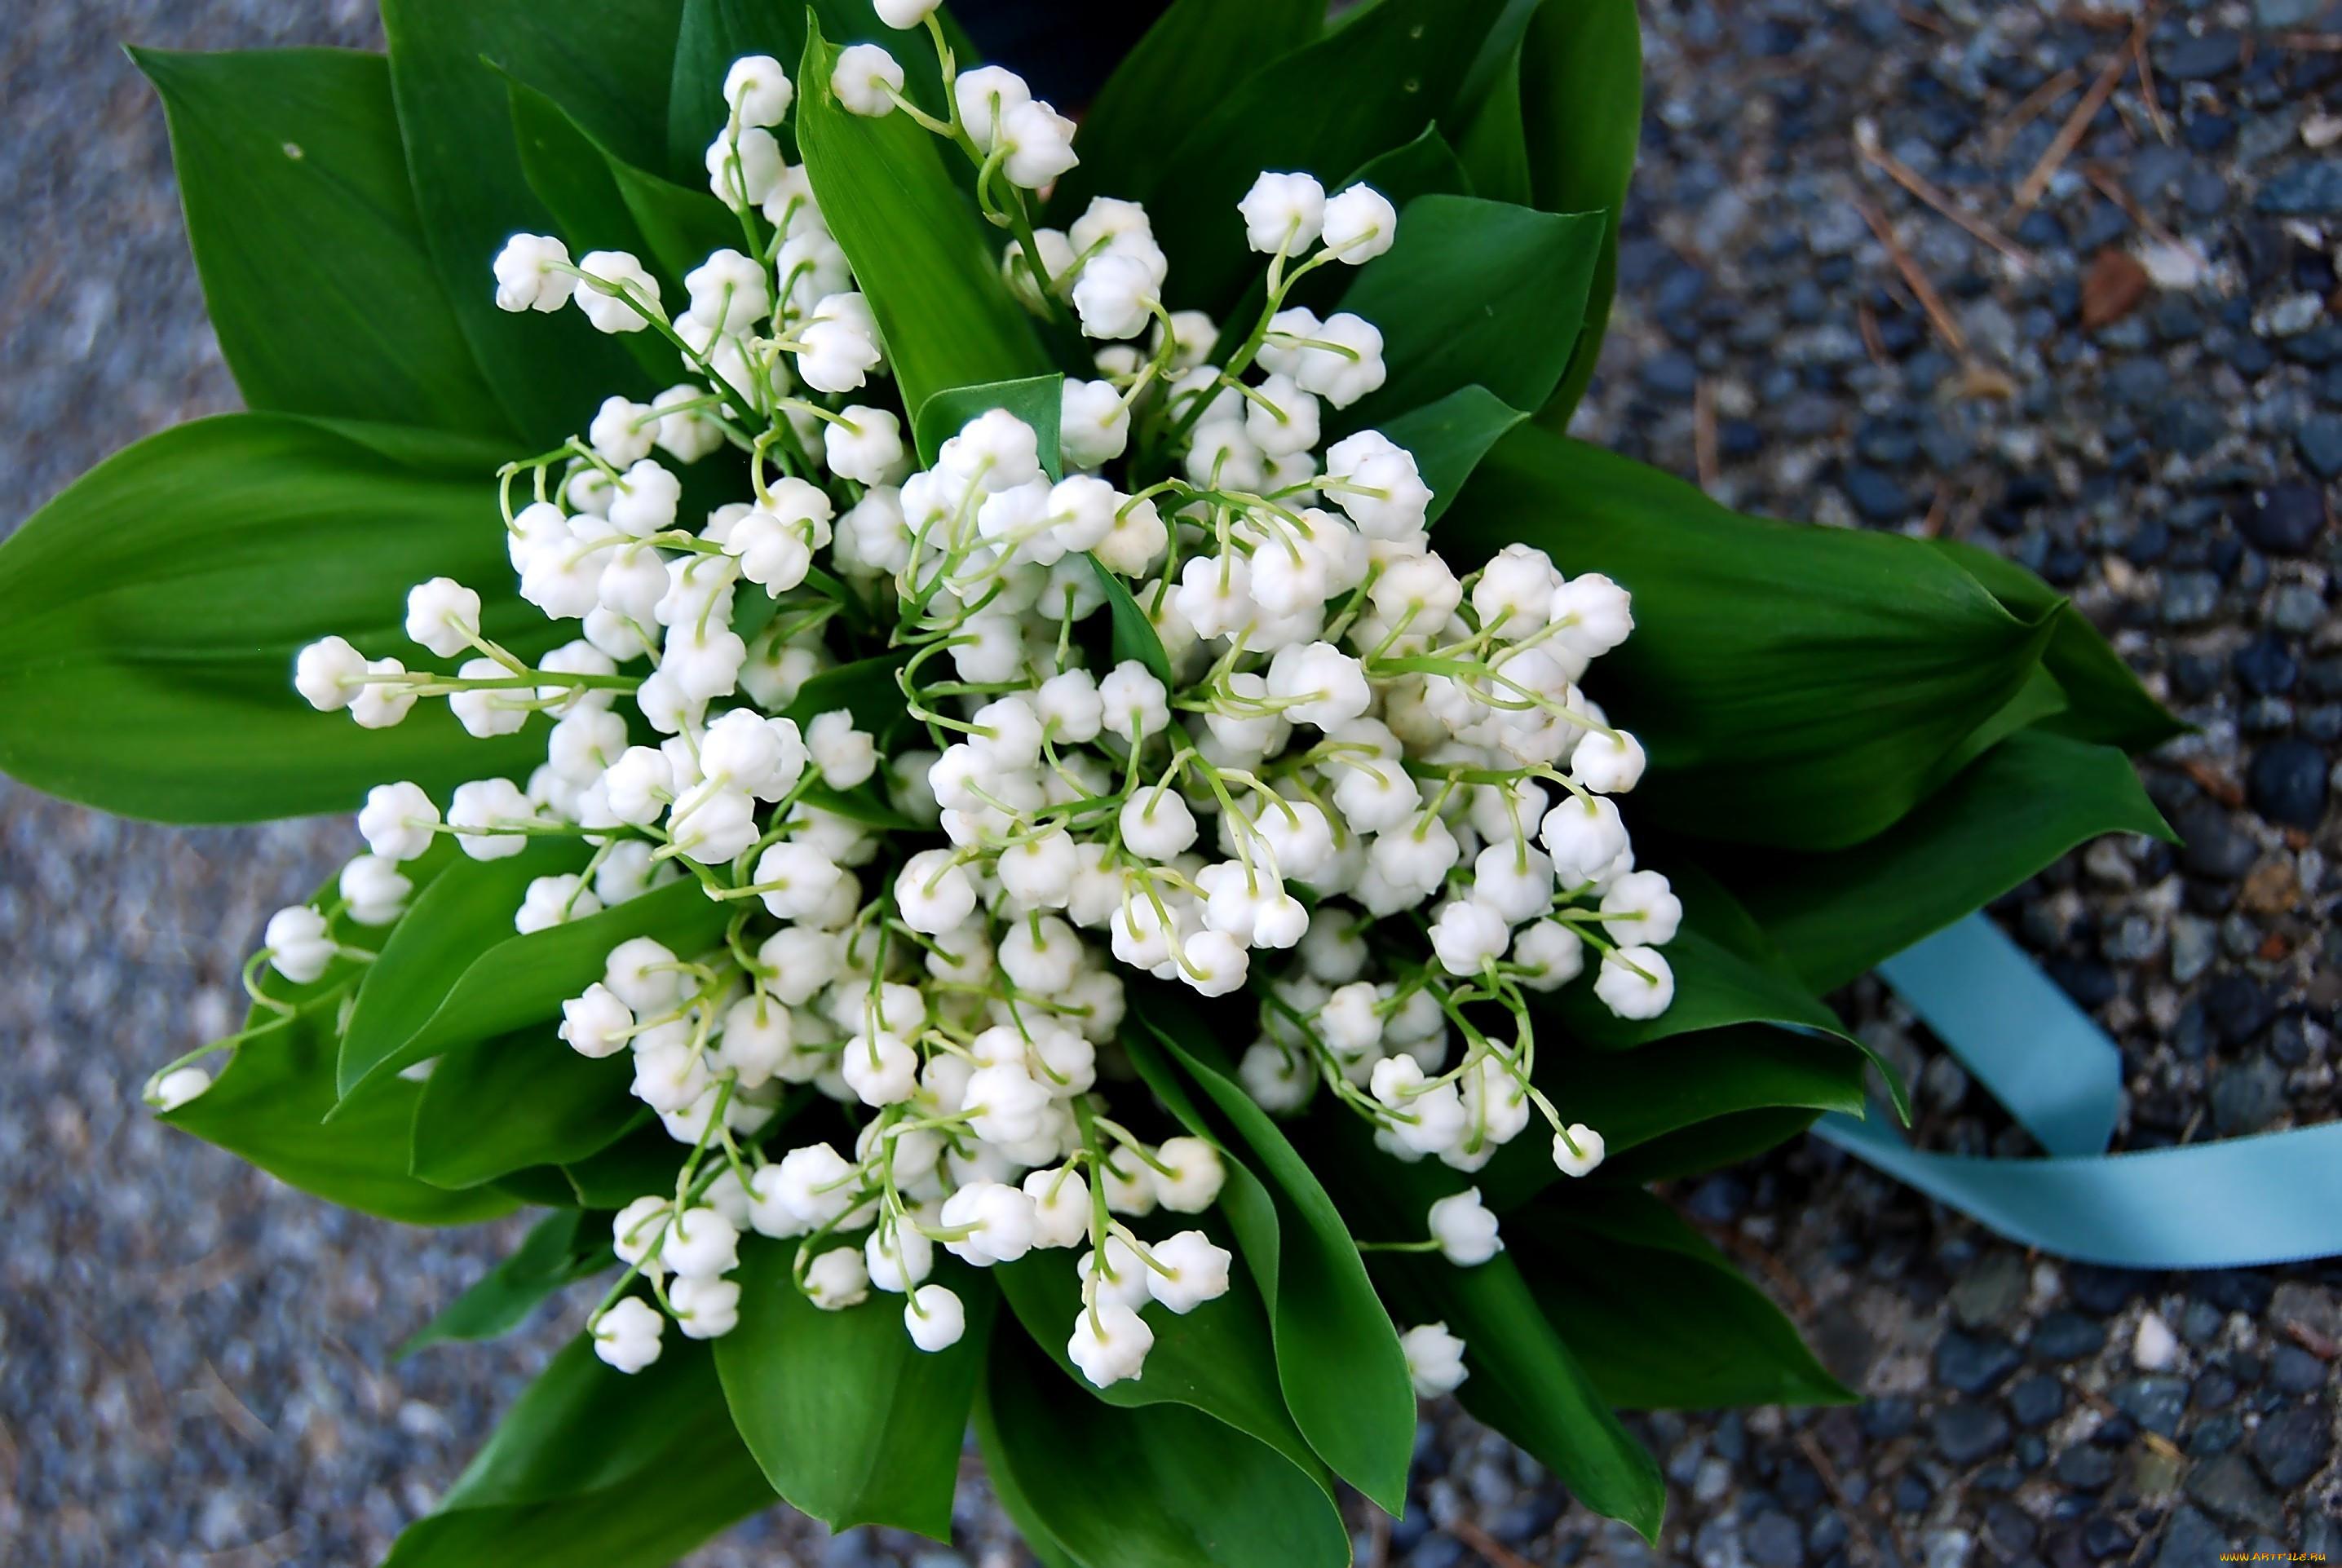 Фото картинки цветы ландыши